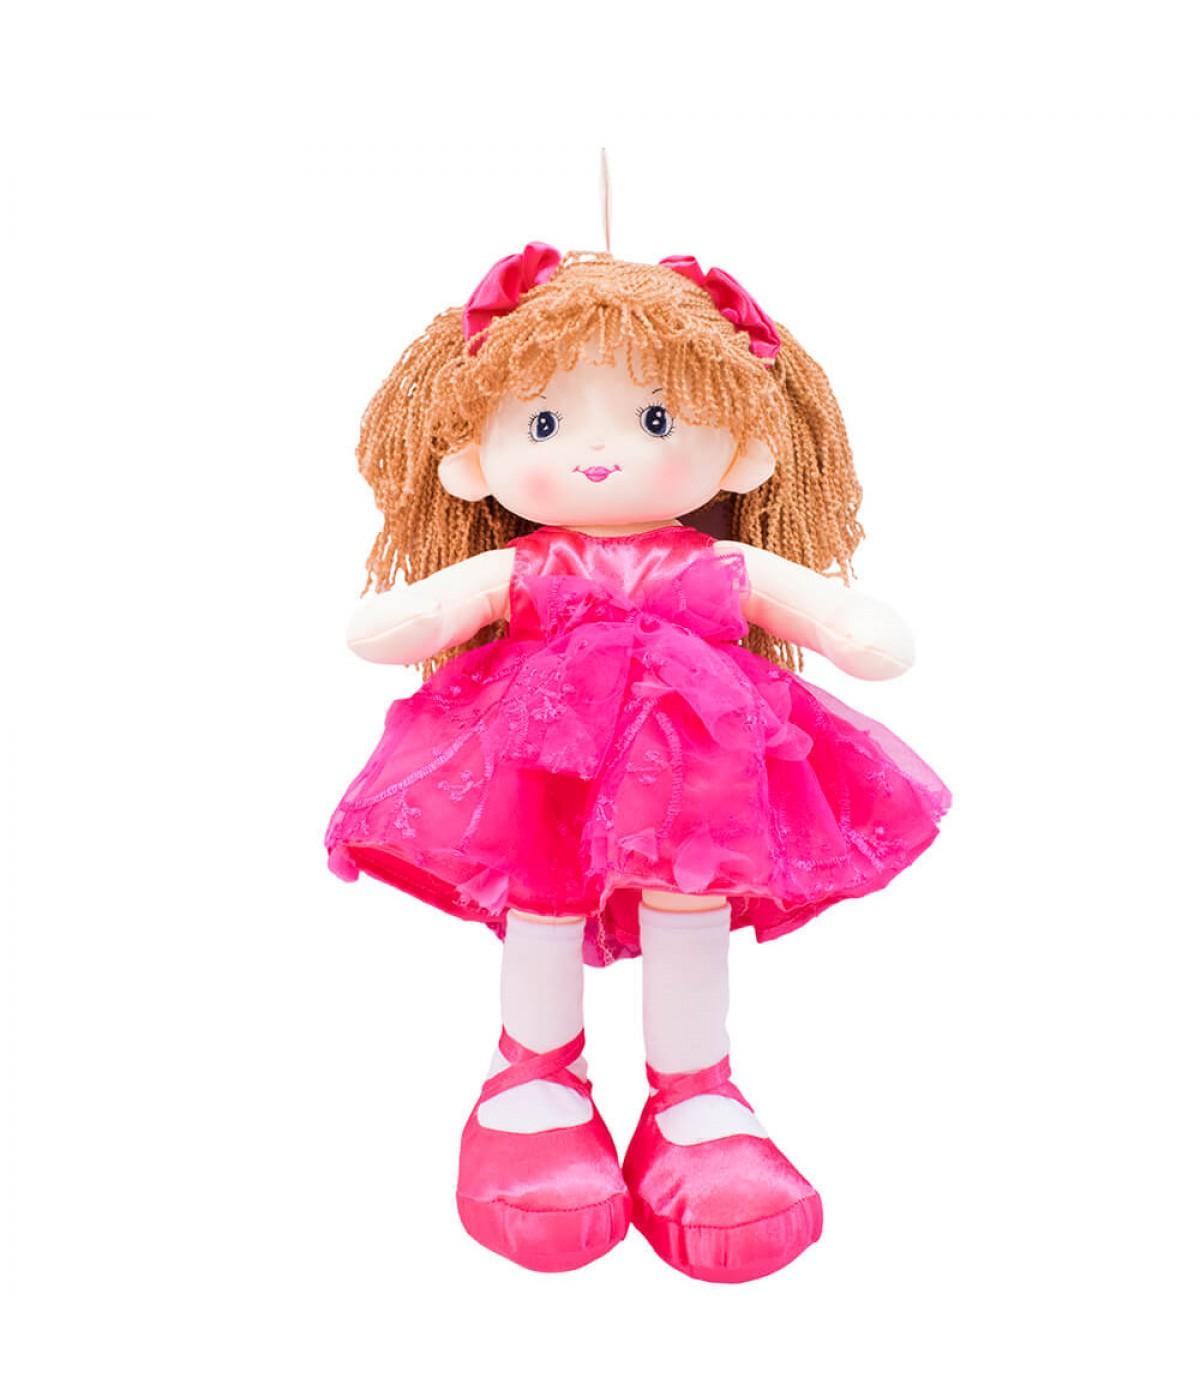 Boneca Bailarina Vestido pink 48cm